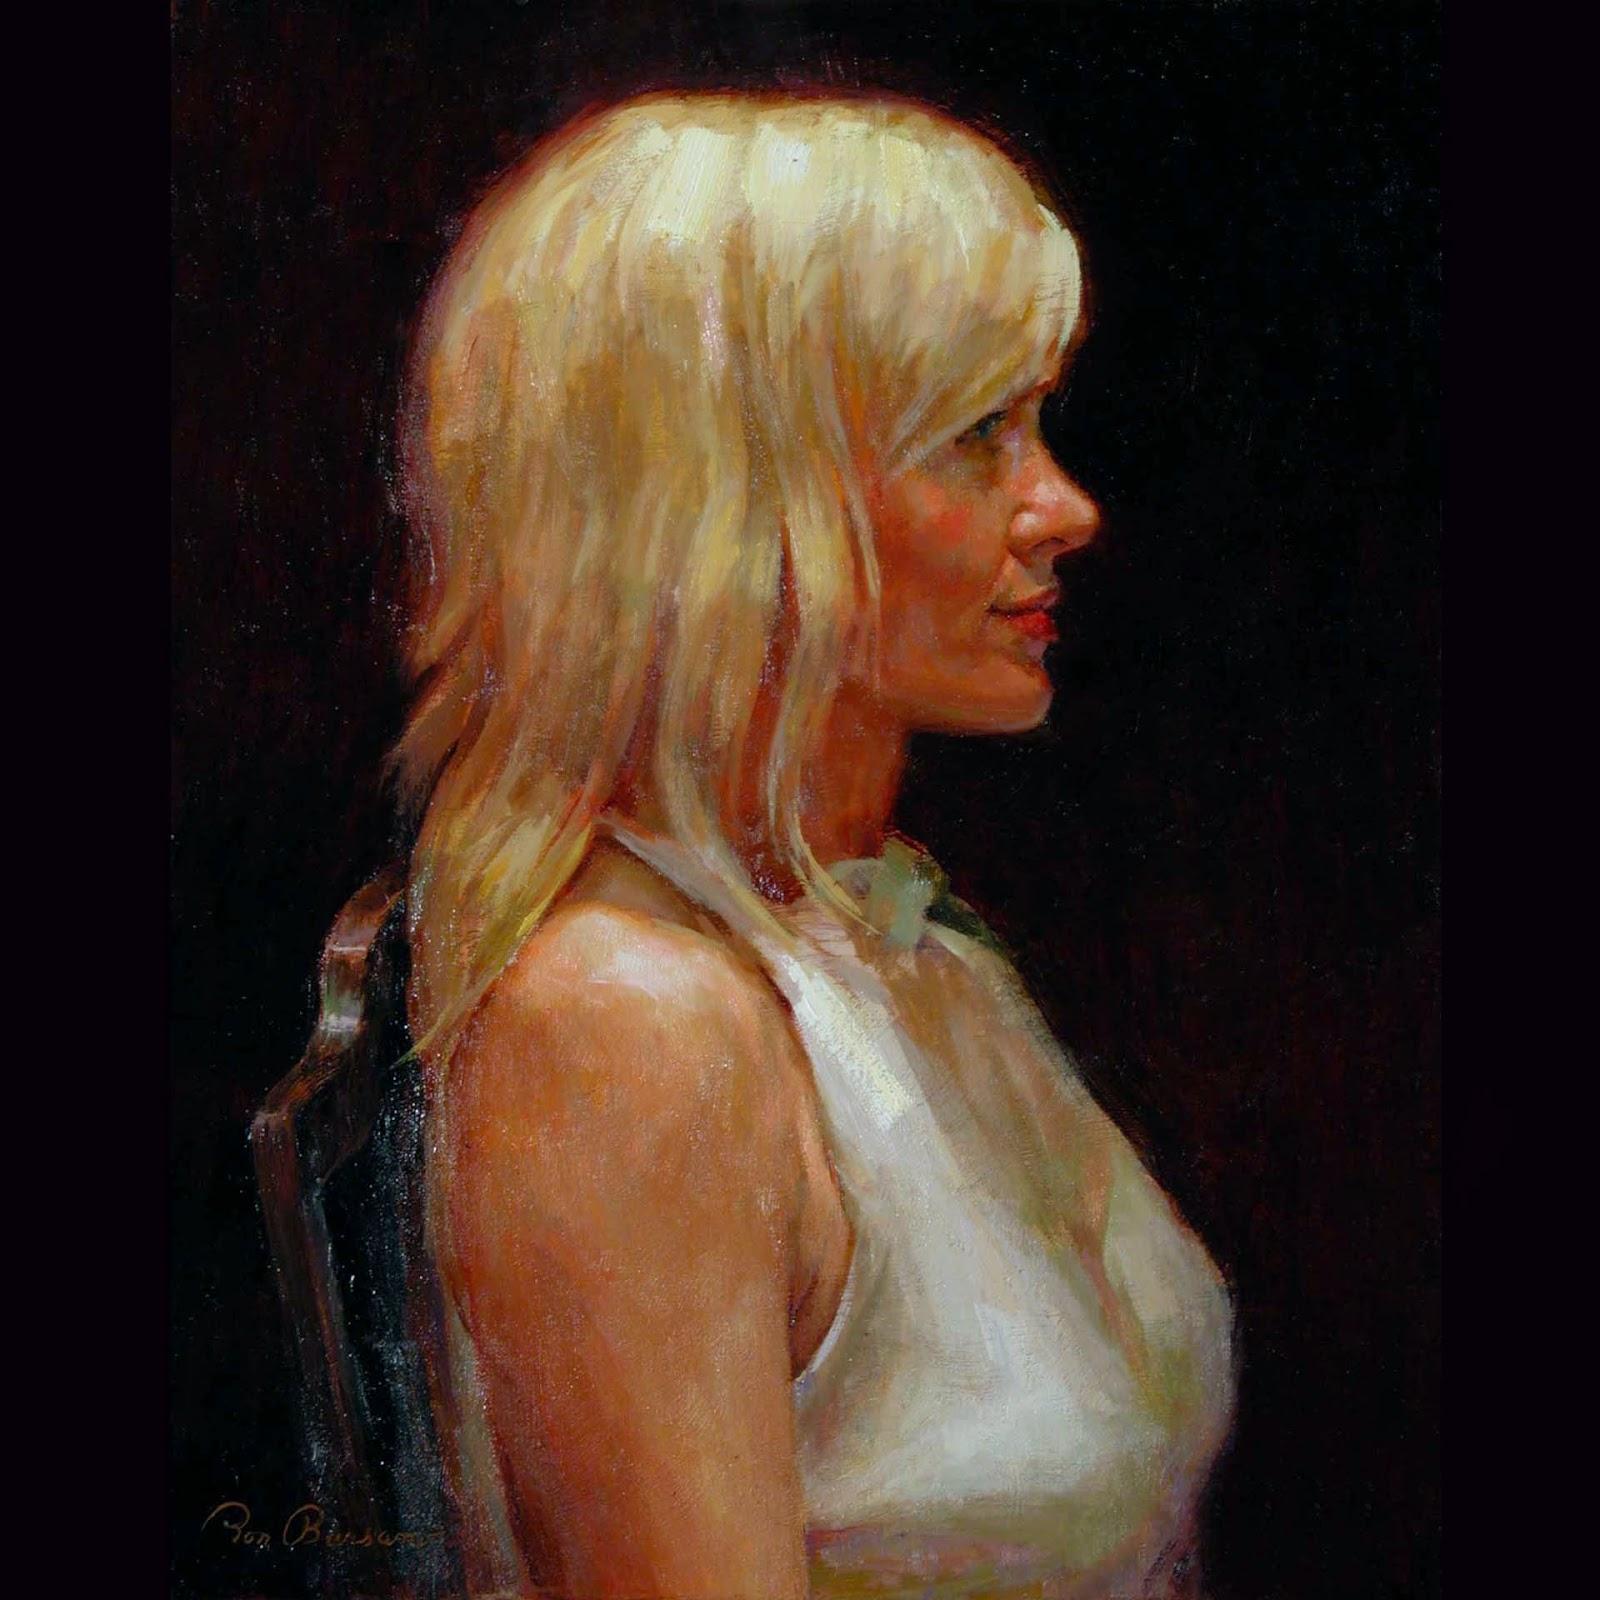 Ron Barsano - An American Artist - Part 2